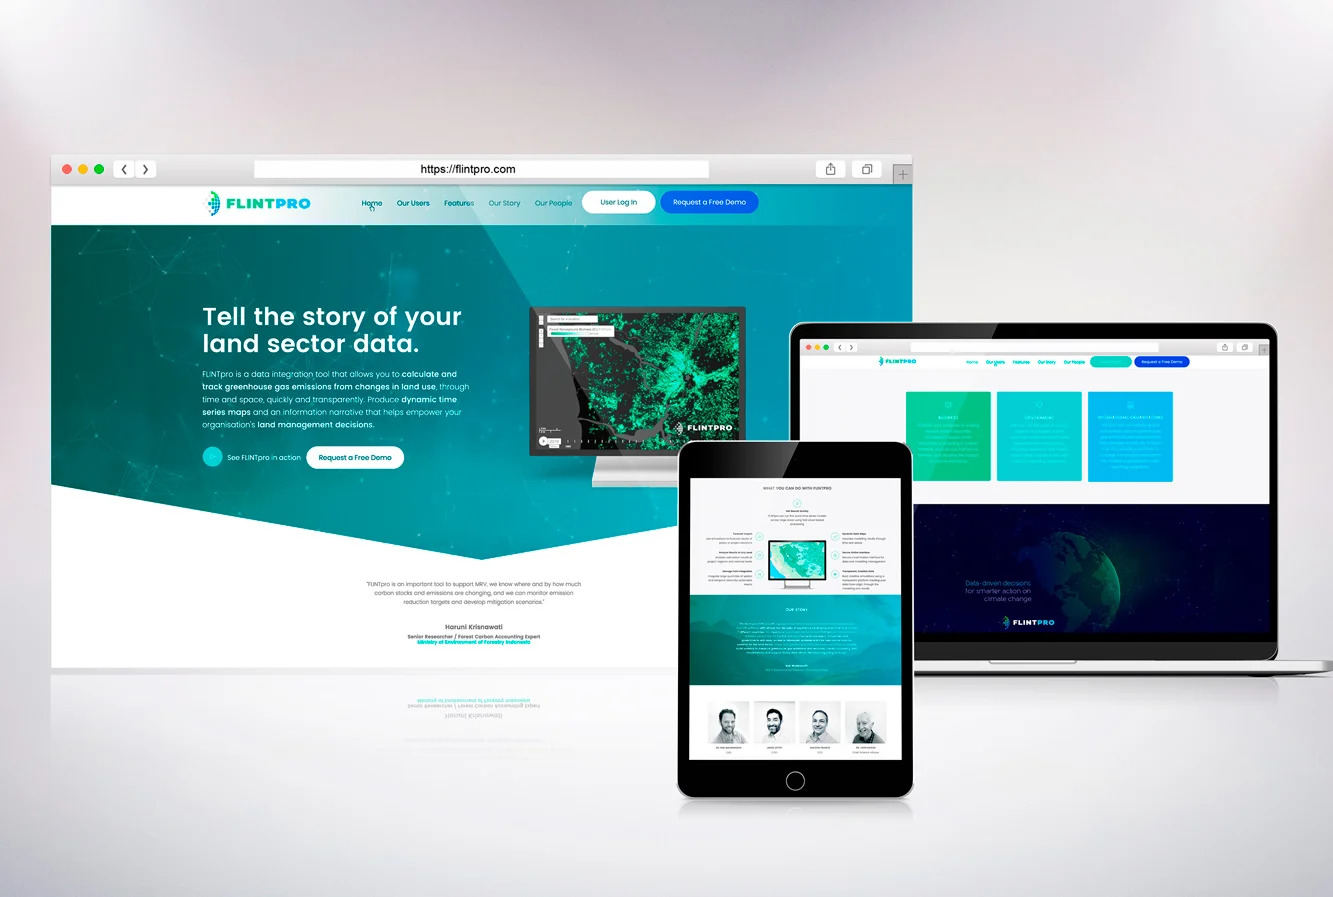 Centrico Digital for FLINTpro